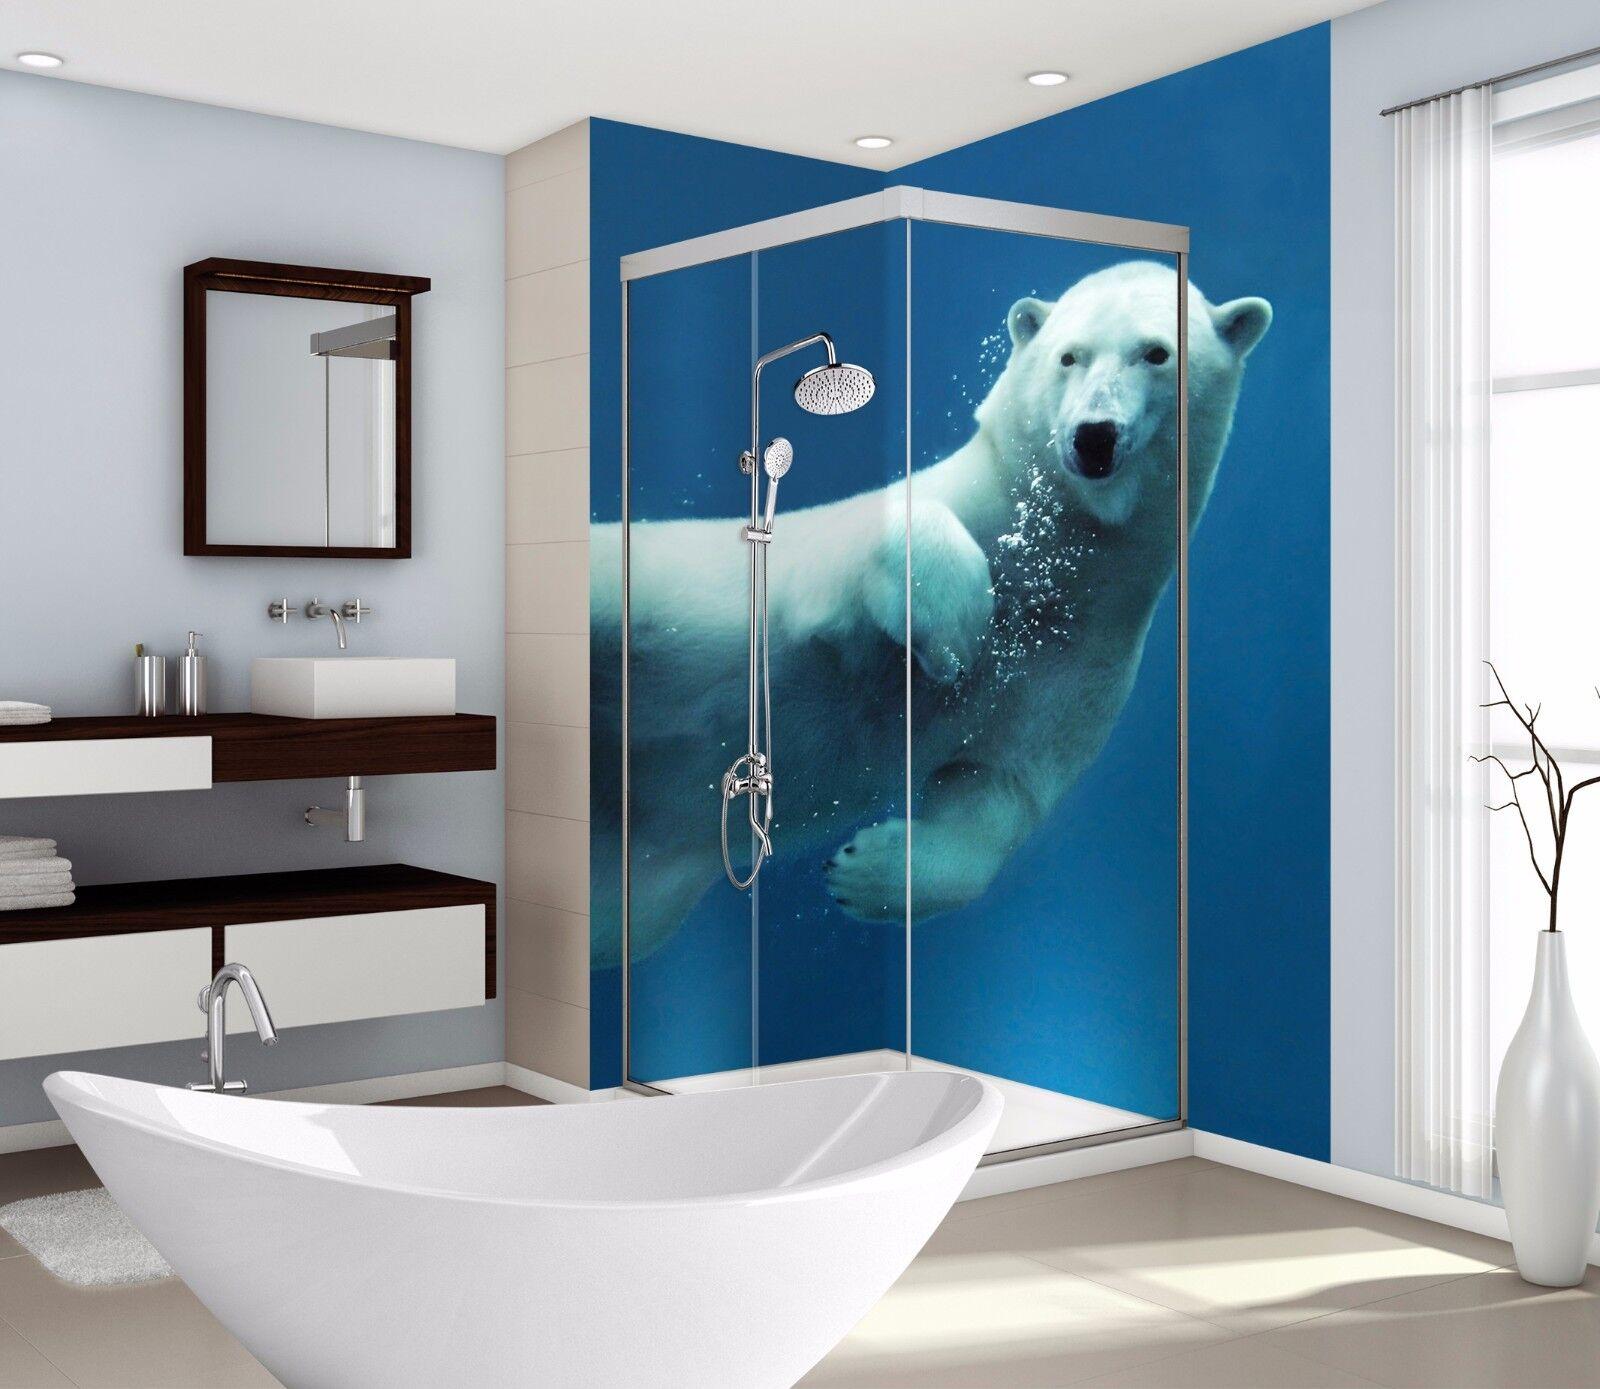 3D Bears  7104  WallPaper Bathroom Print Decal Wall Deco AJ WALLPAPER AU